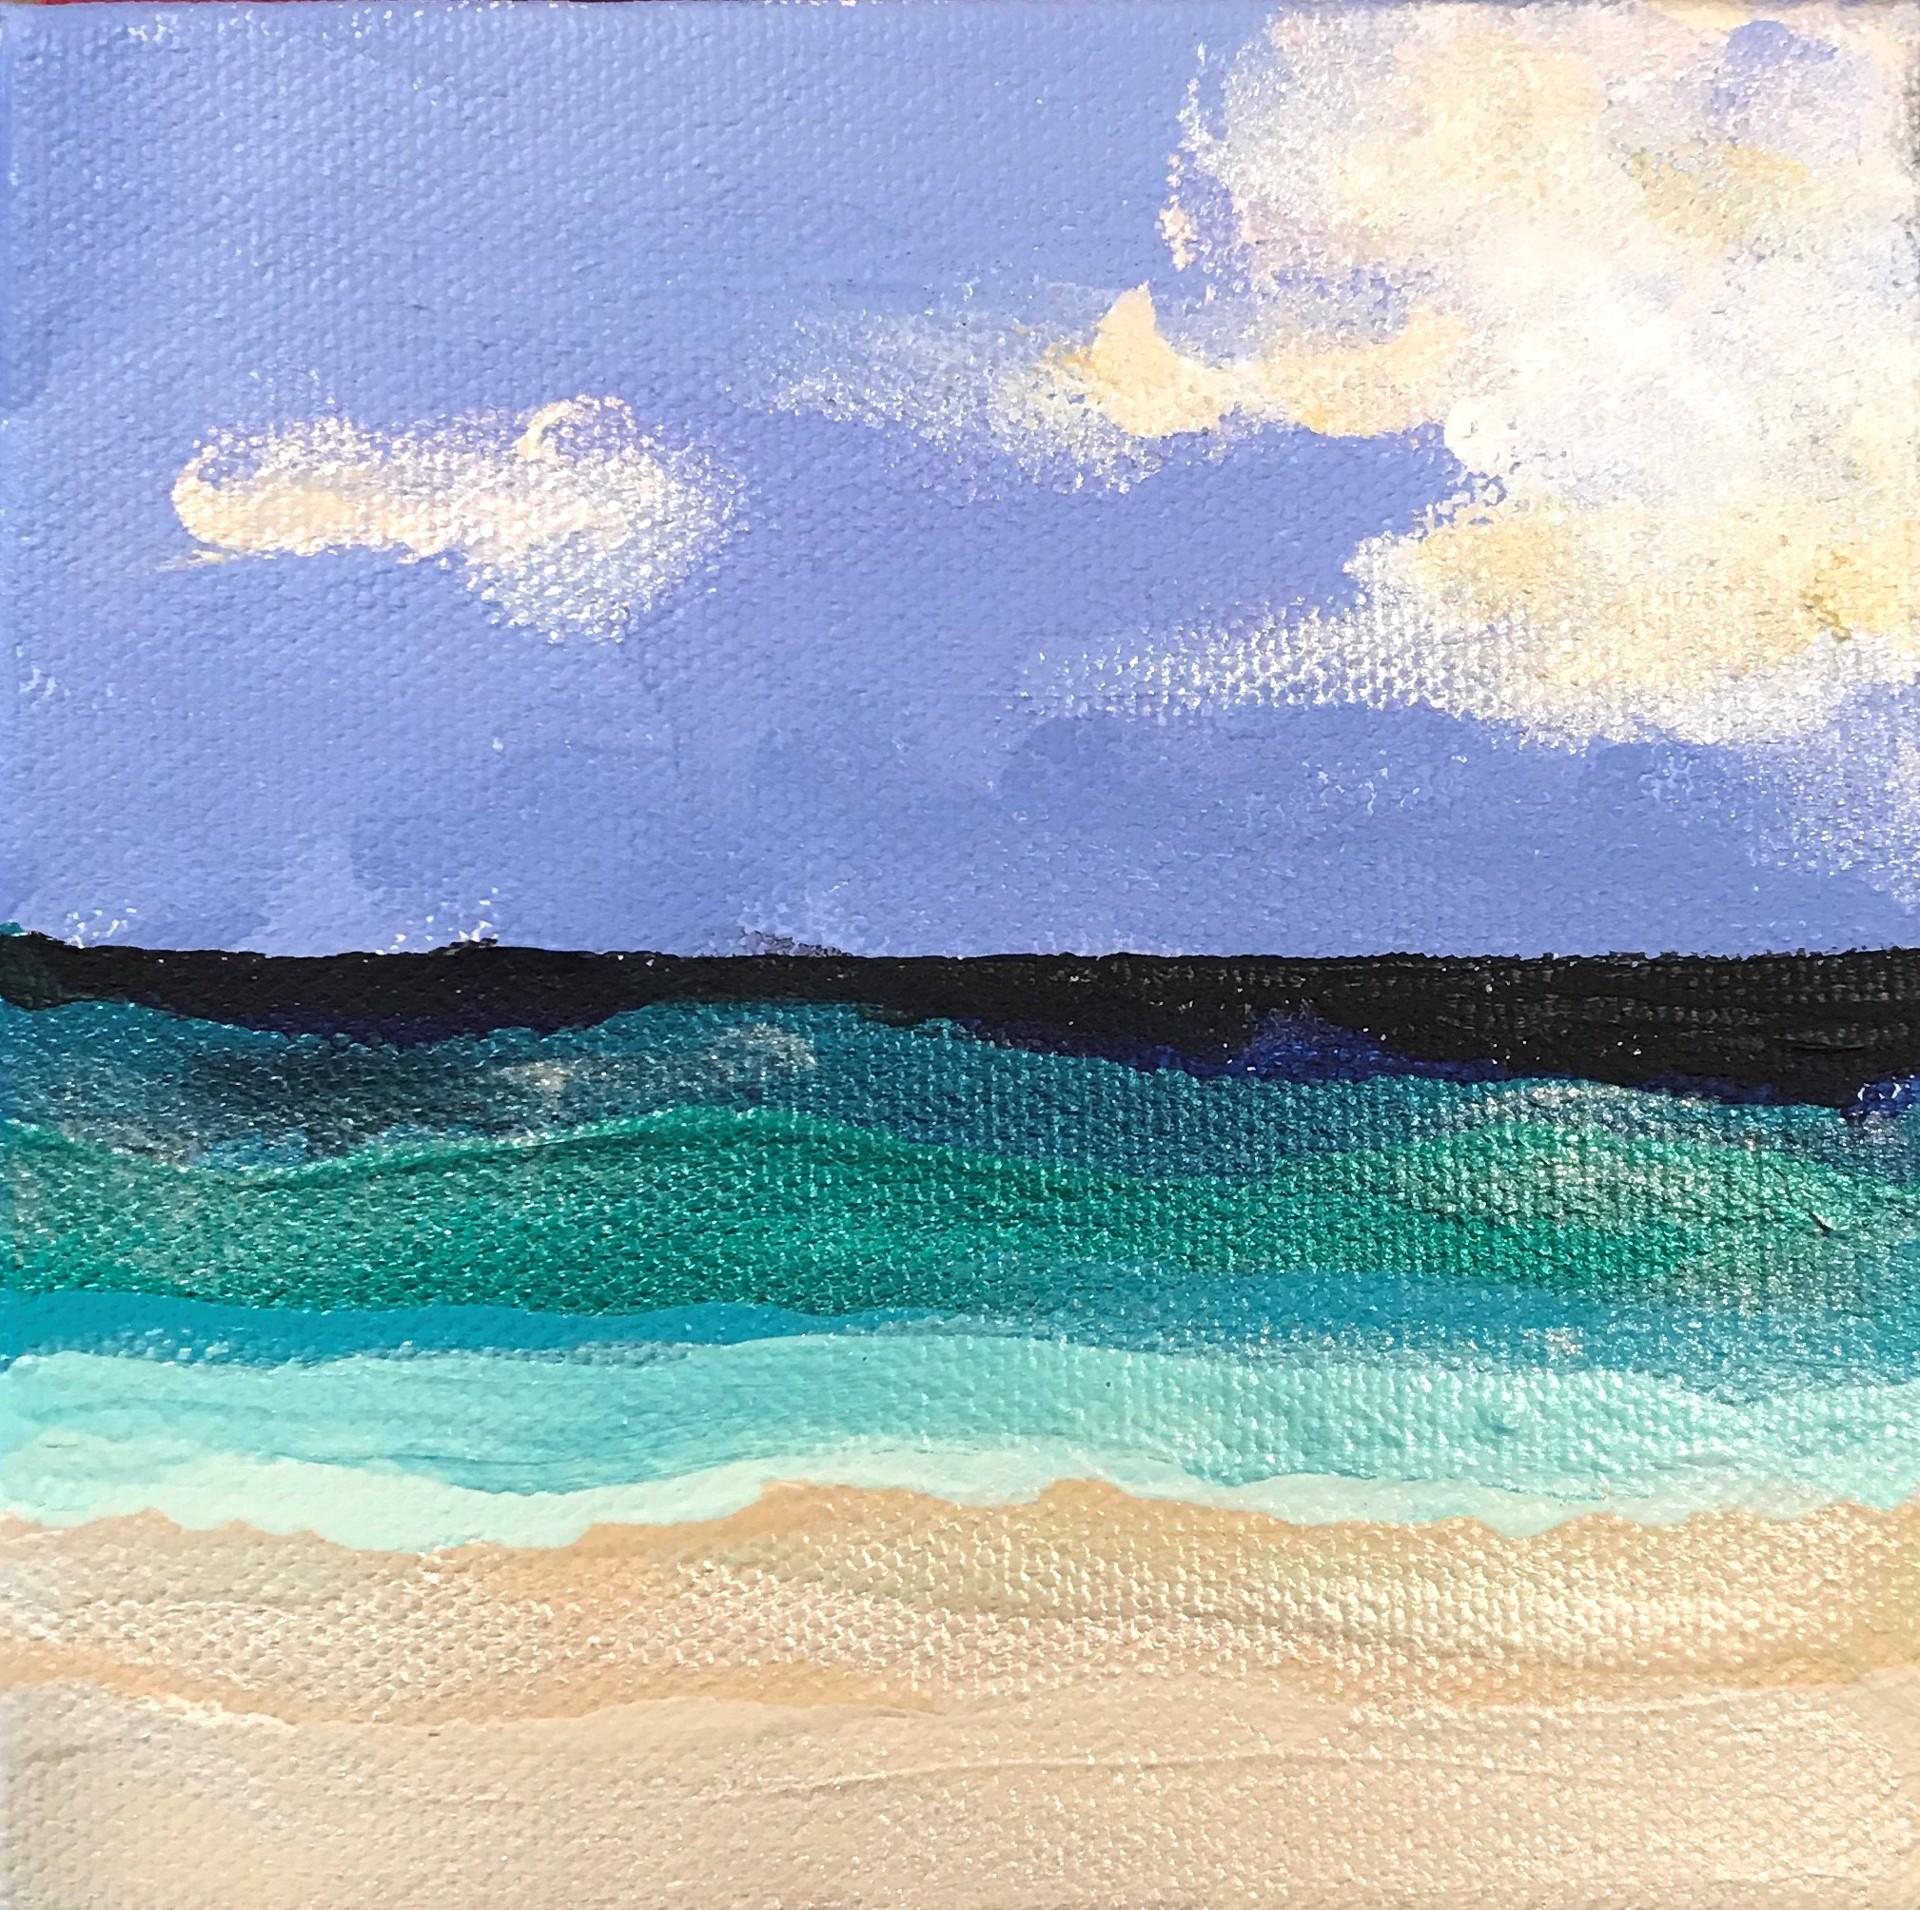 Beachfront No. 9 by Leslie Poteet Busker